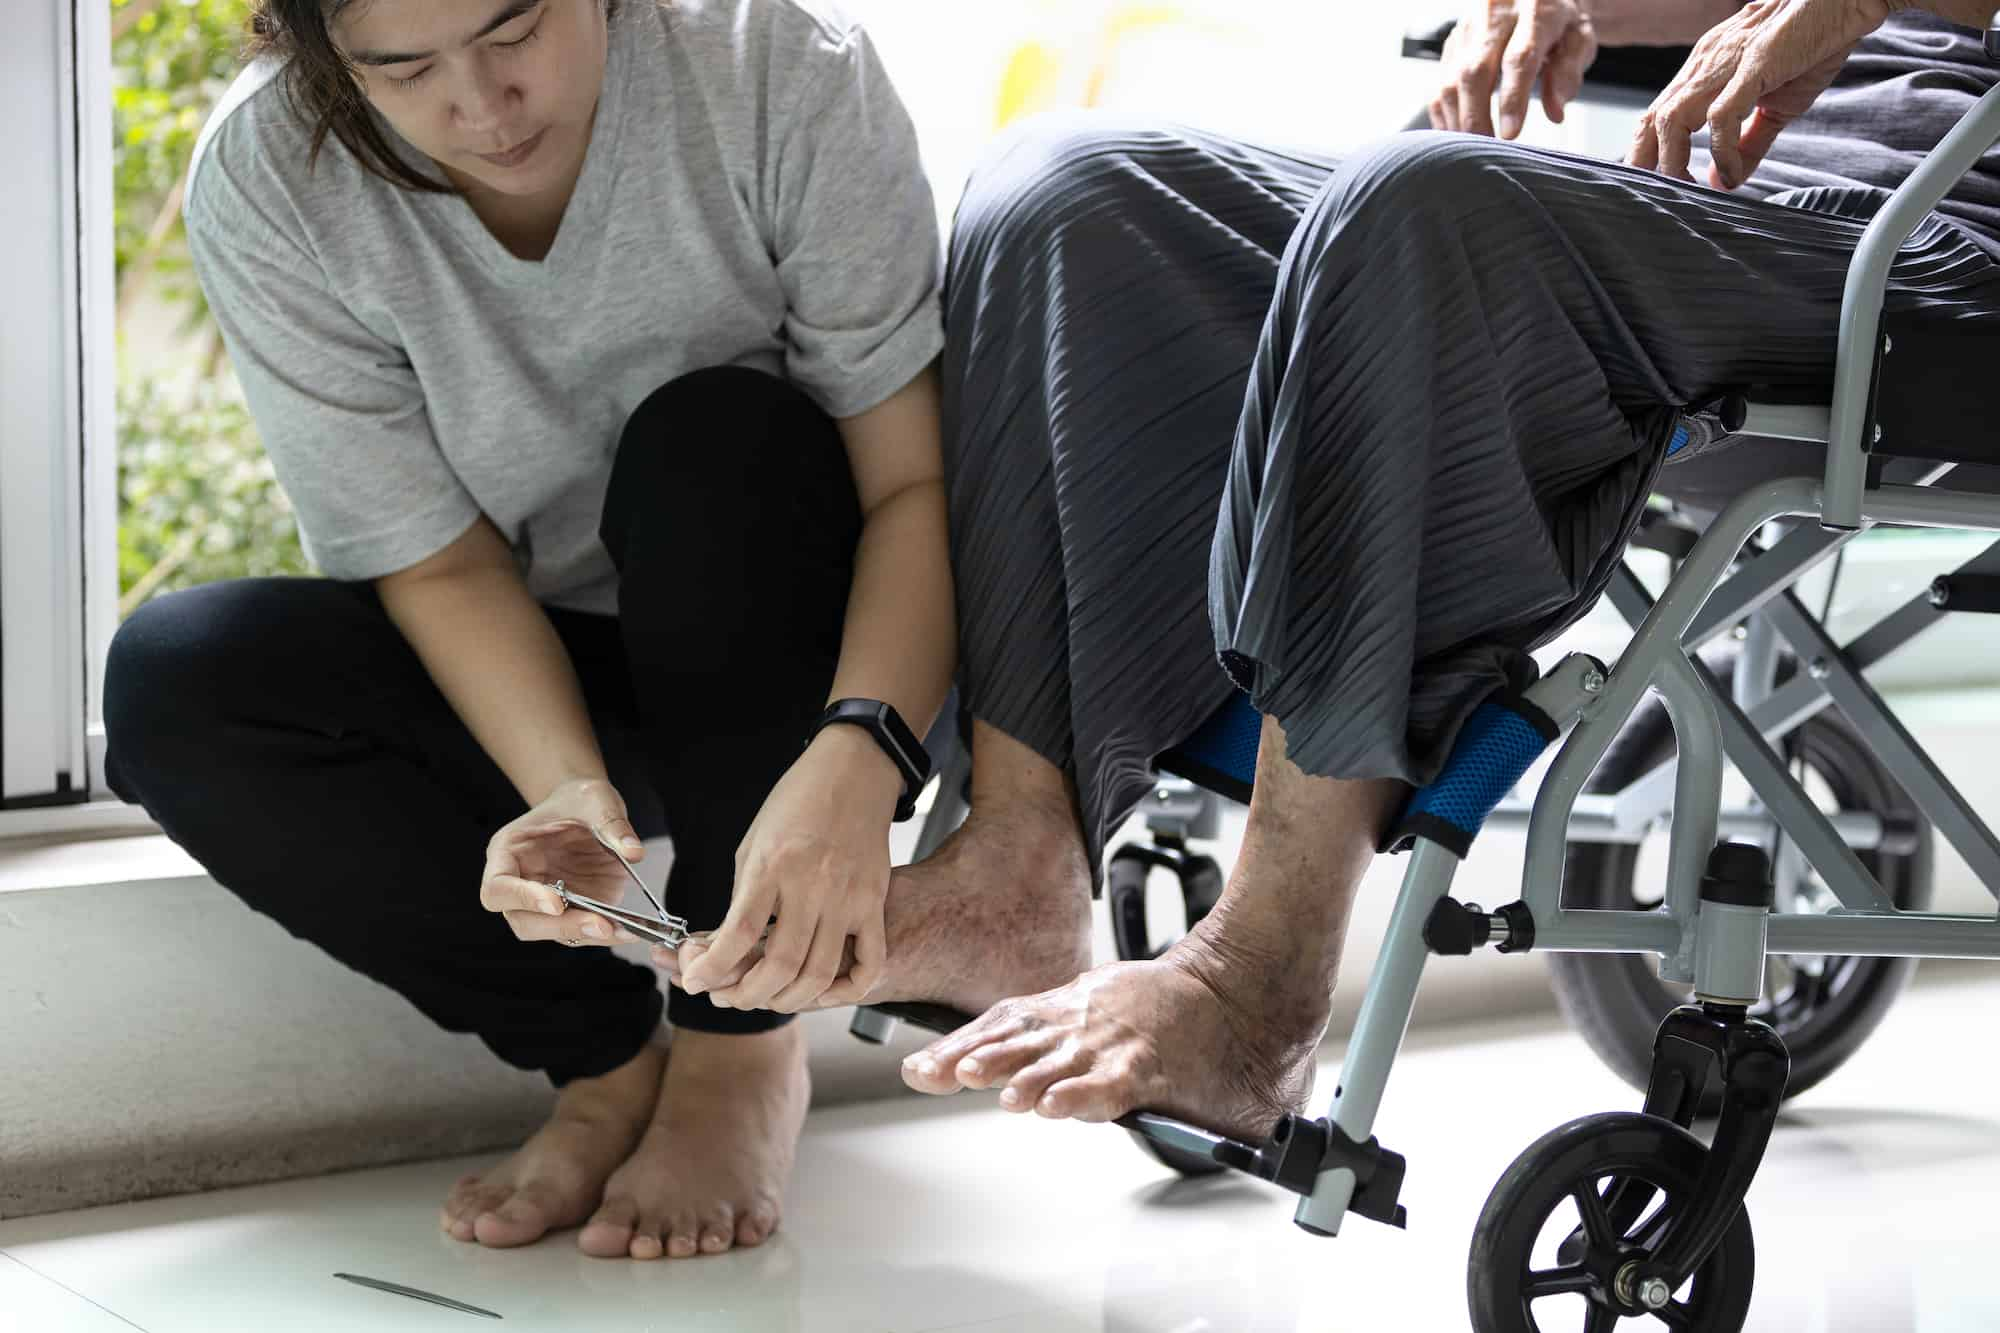 clipping elderly toe nails